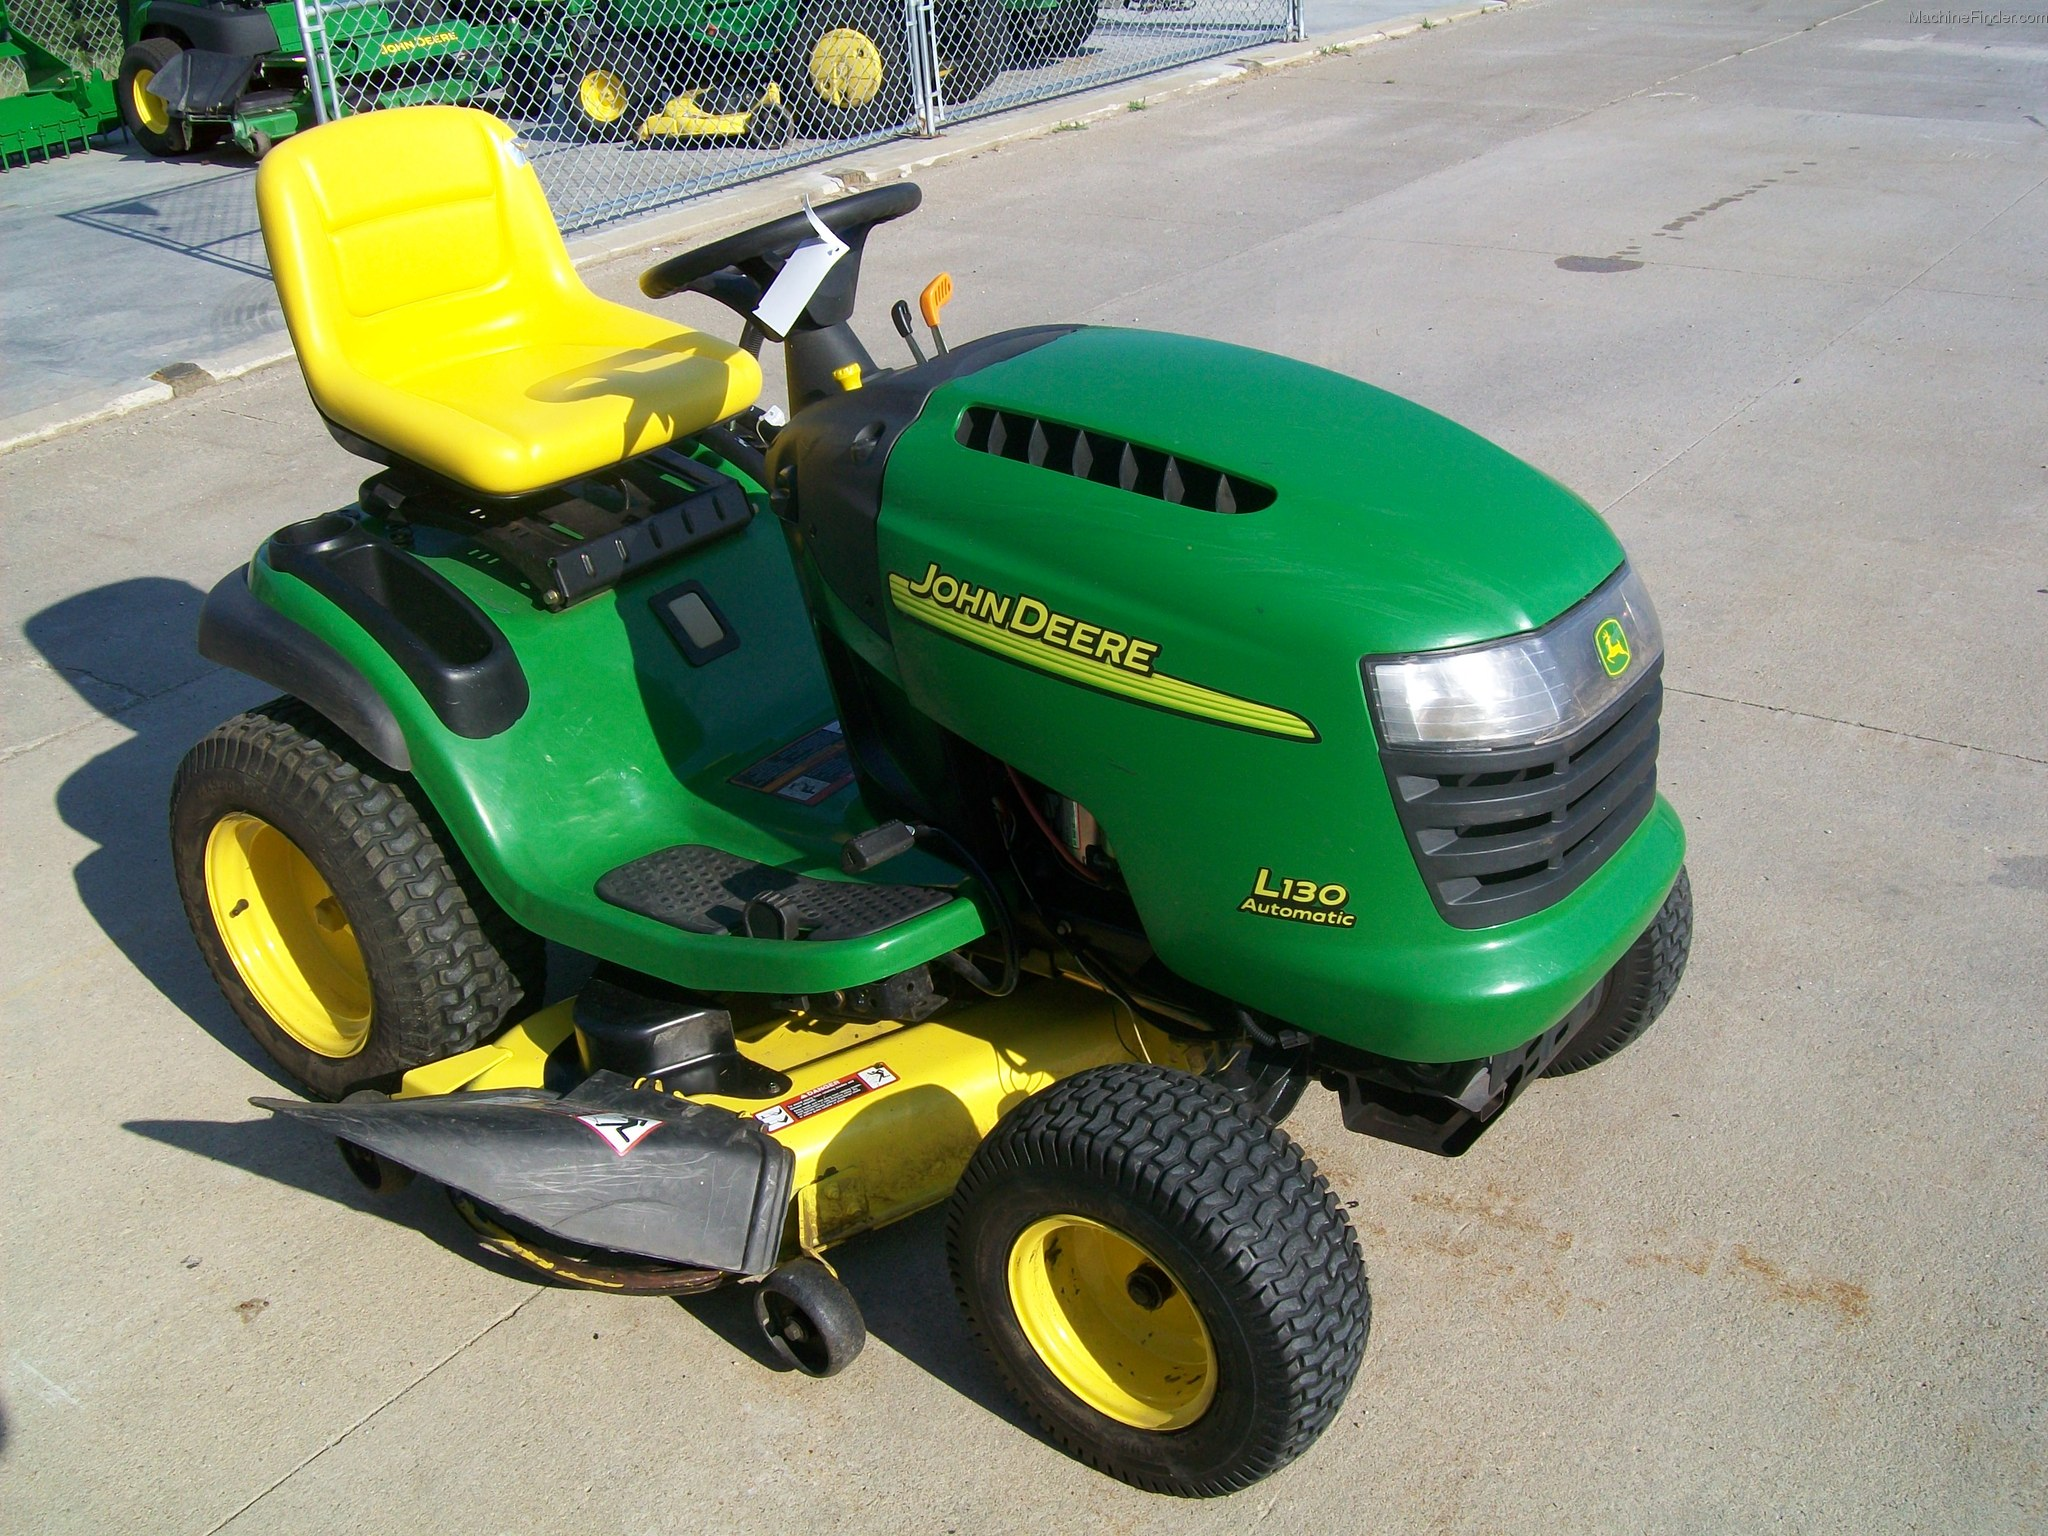 John deere l130 lawn Tractor Specs la115 riding mower Manual